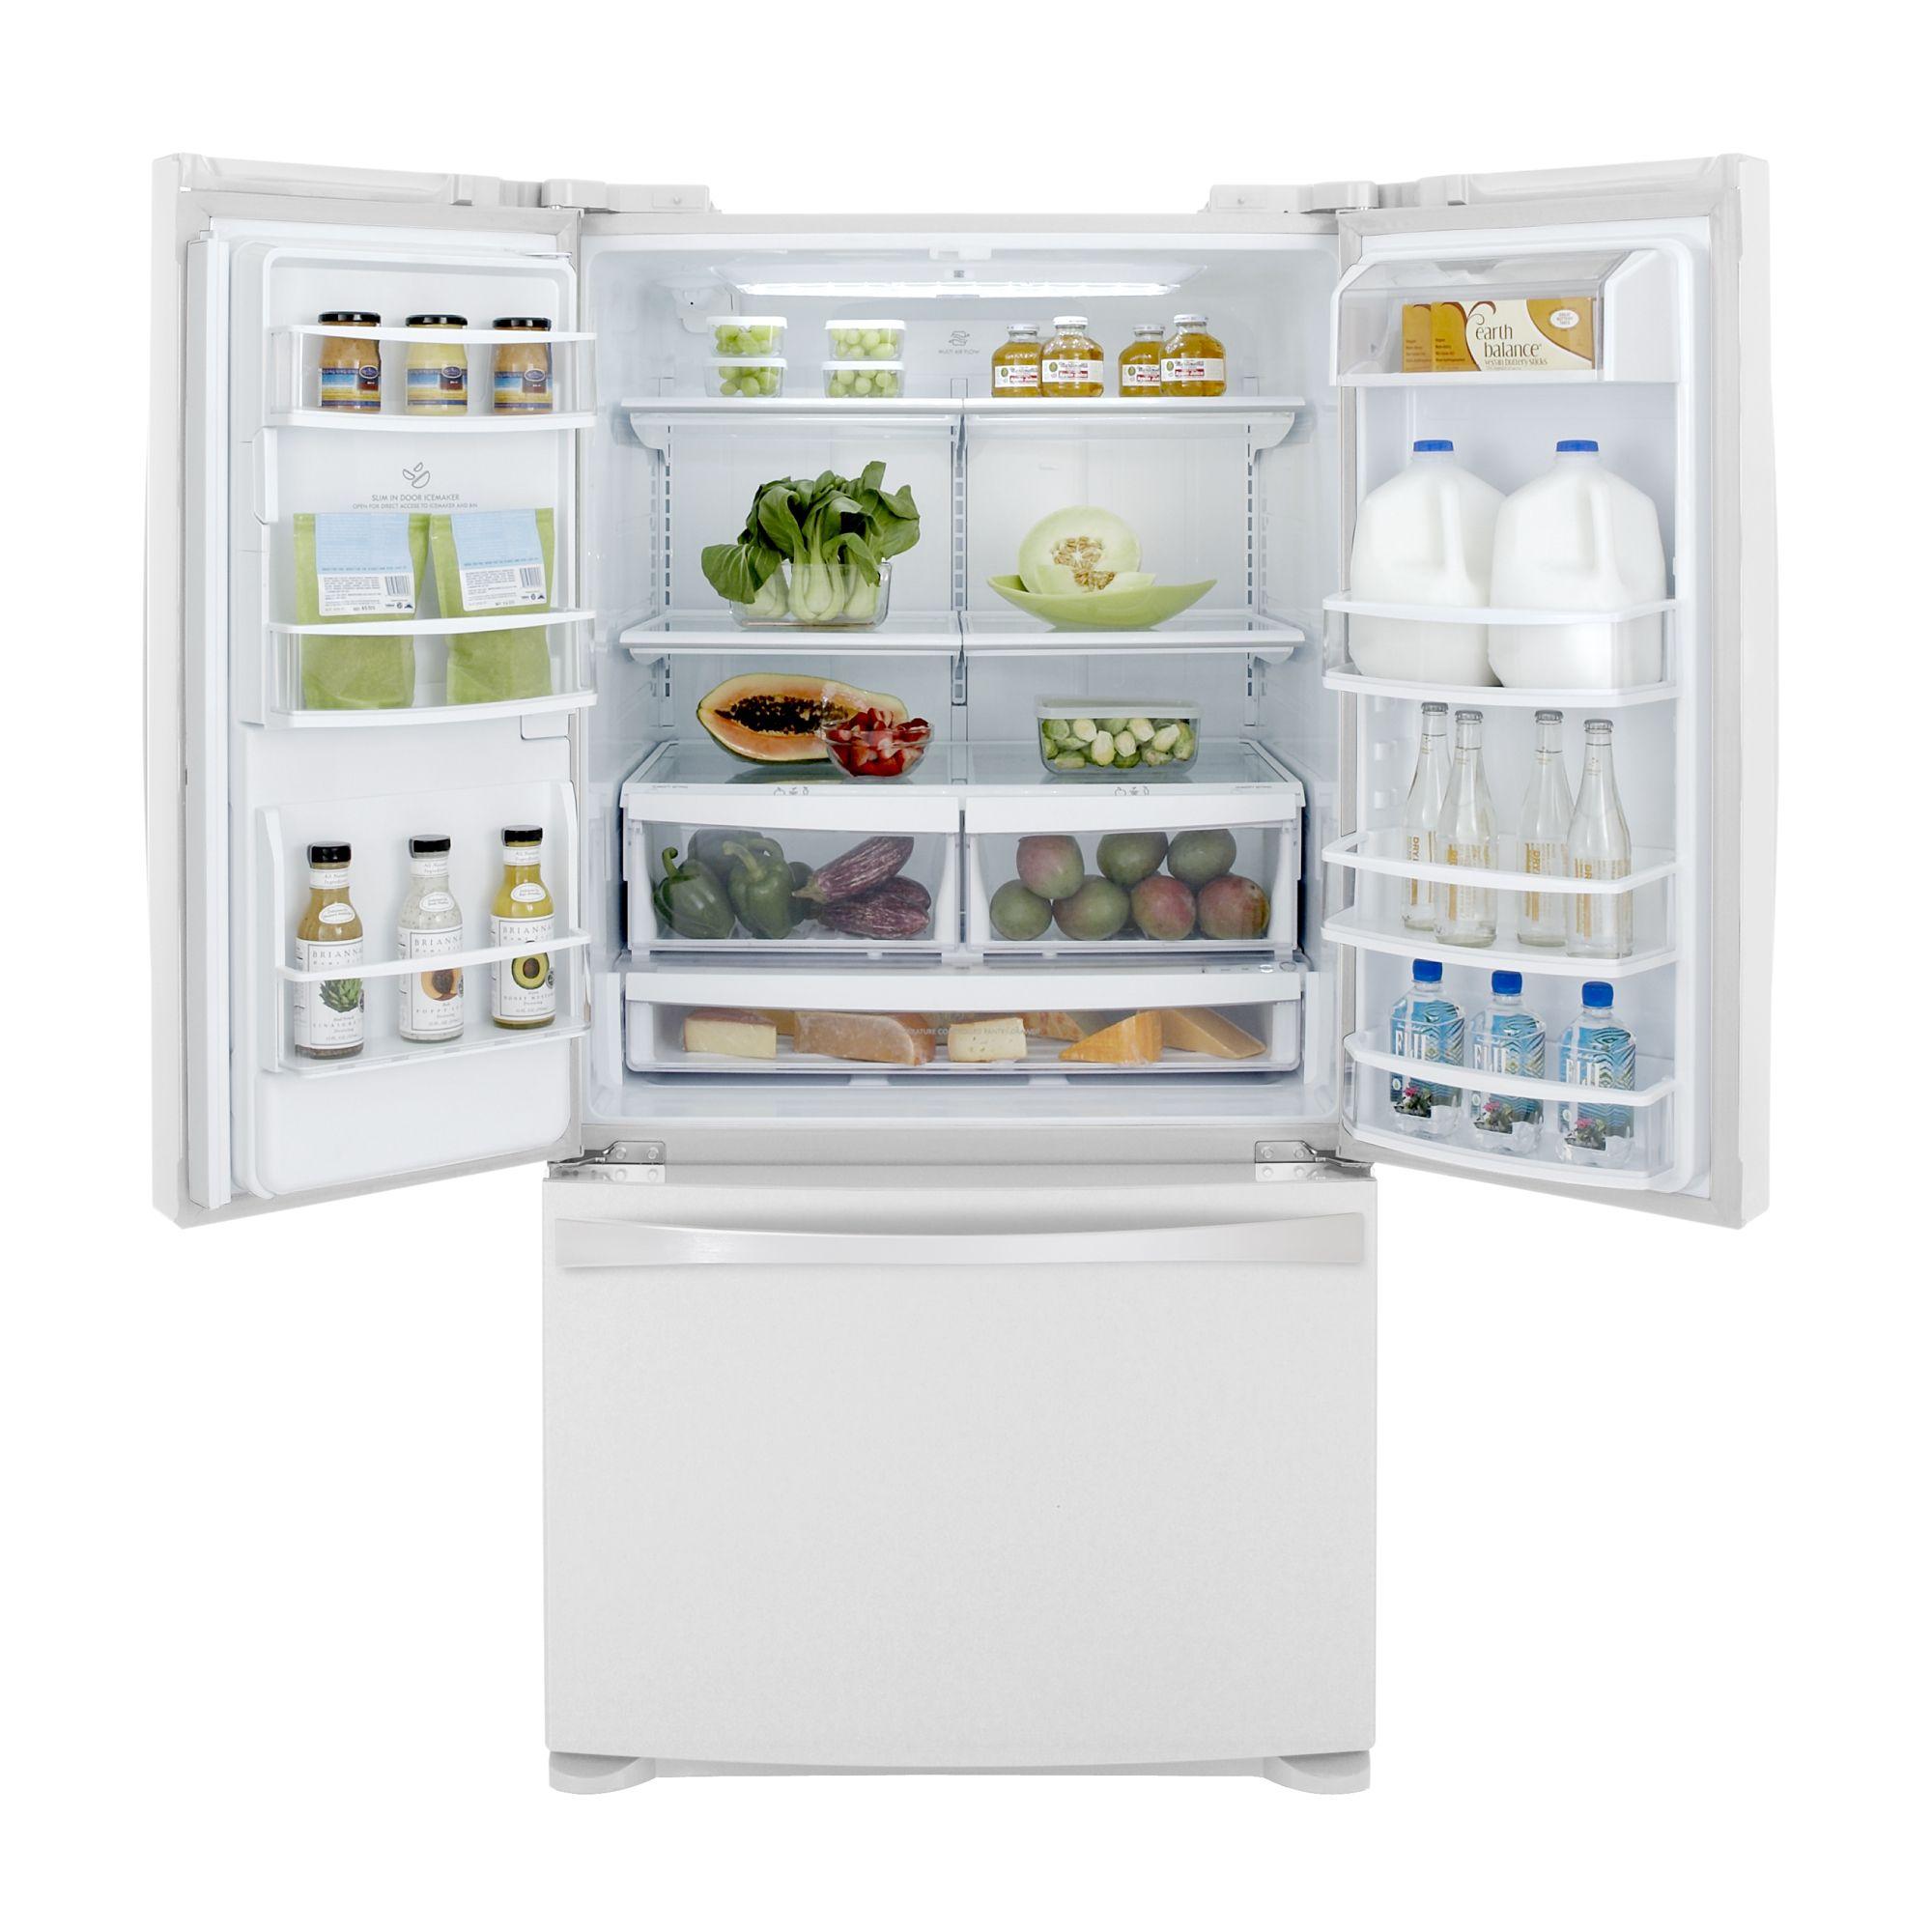 Kenmore Elite 27.6 cu. ft. French Door Bottom-Freezer Refrigerator - White